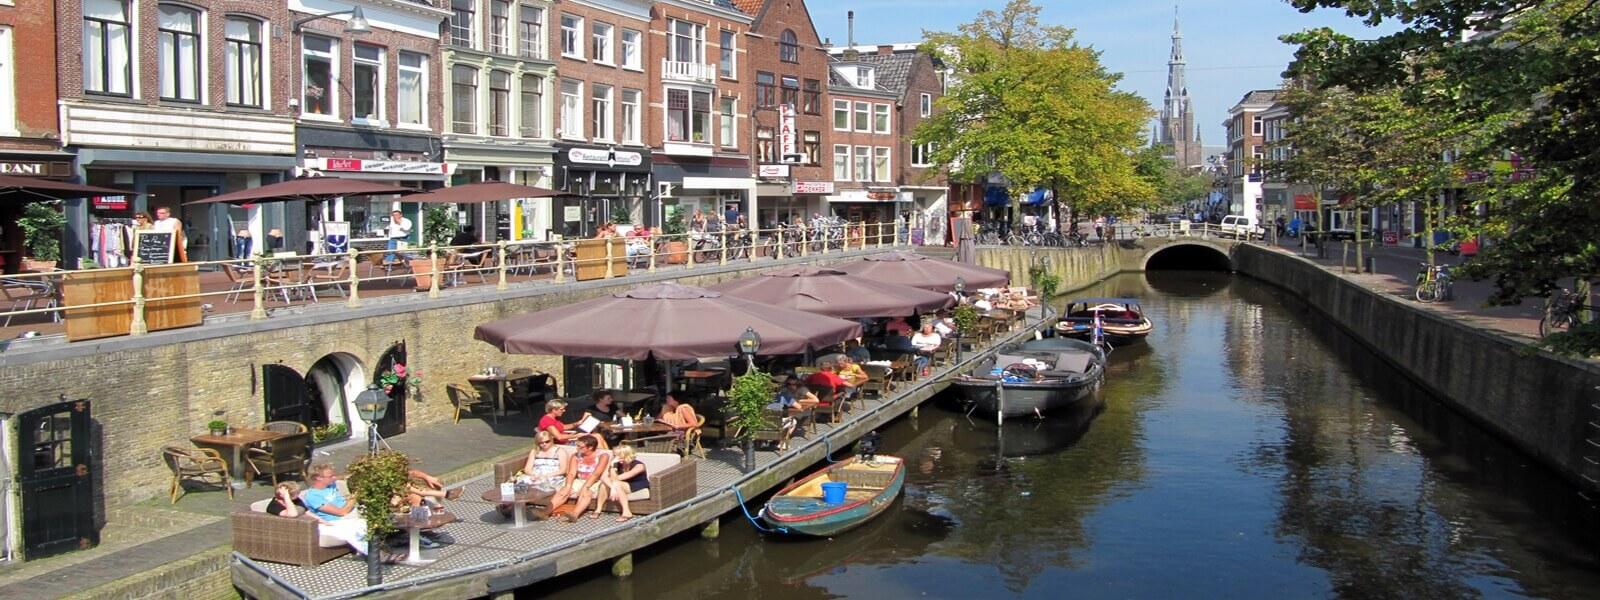 studyinholland-universitiesofappliedsciences-stenden-holland-leeuwarden